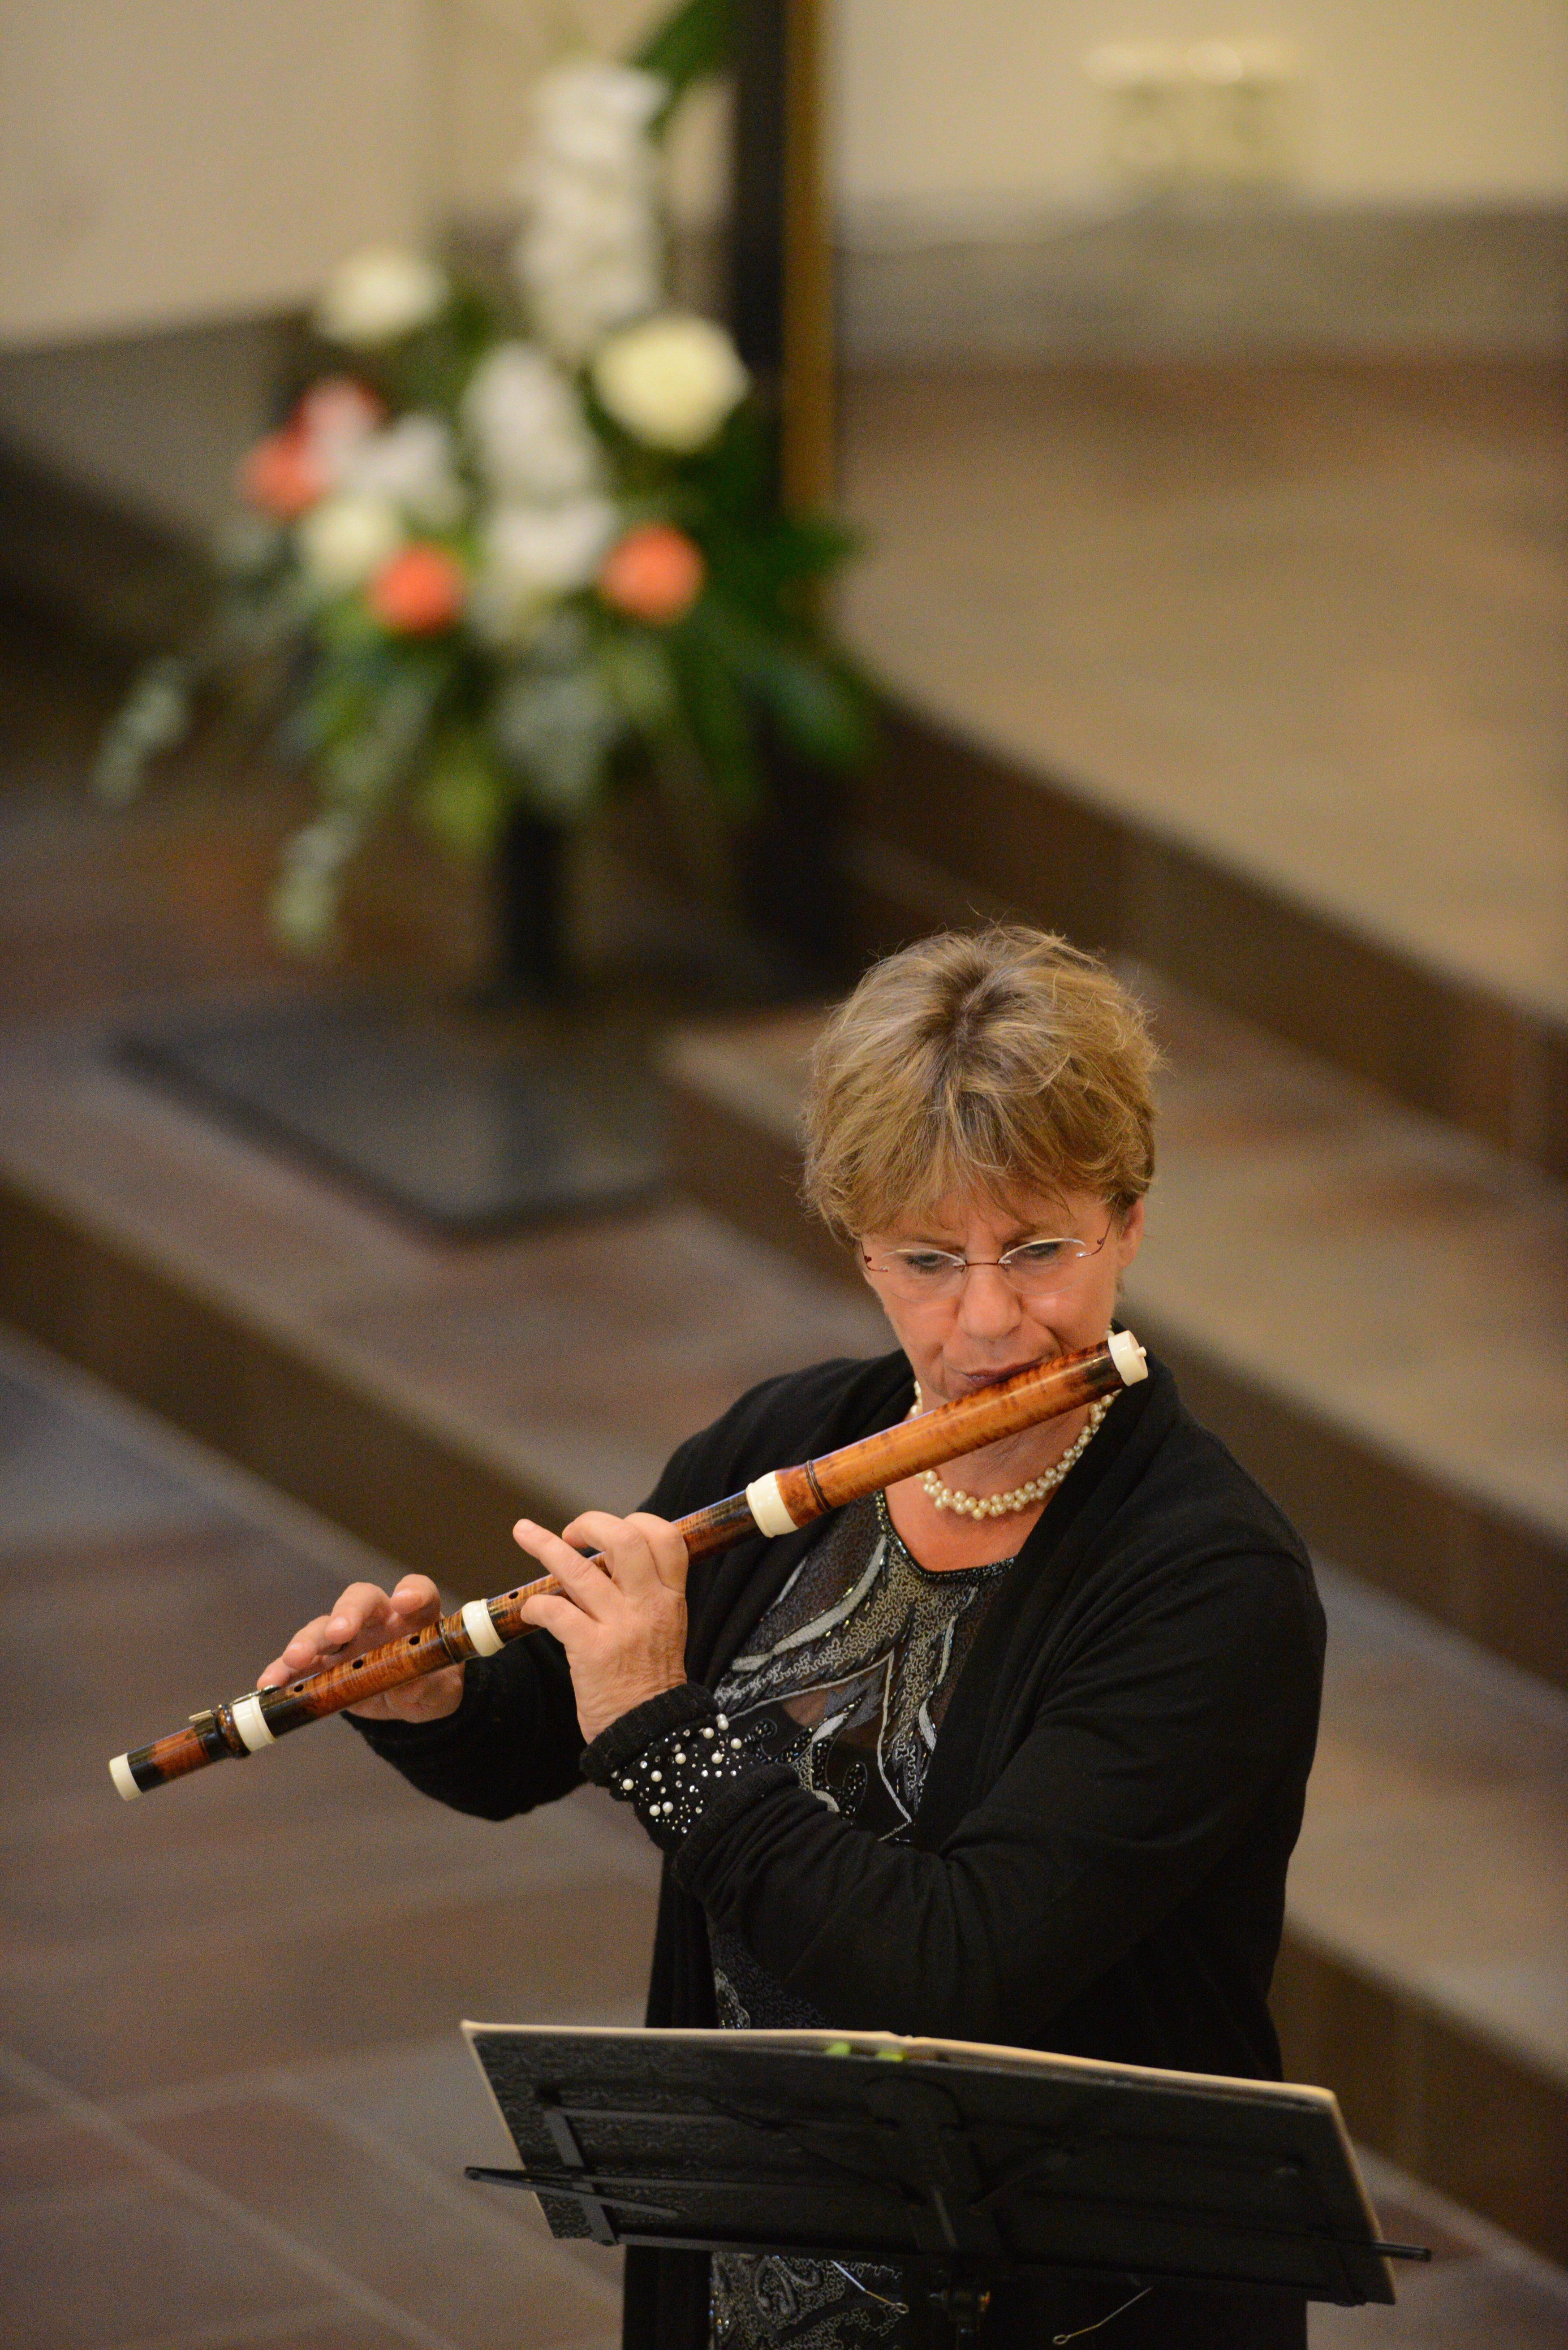 Linde Brunmayr-Tutz